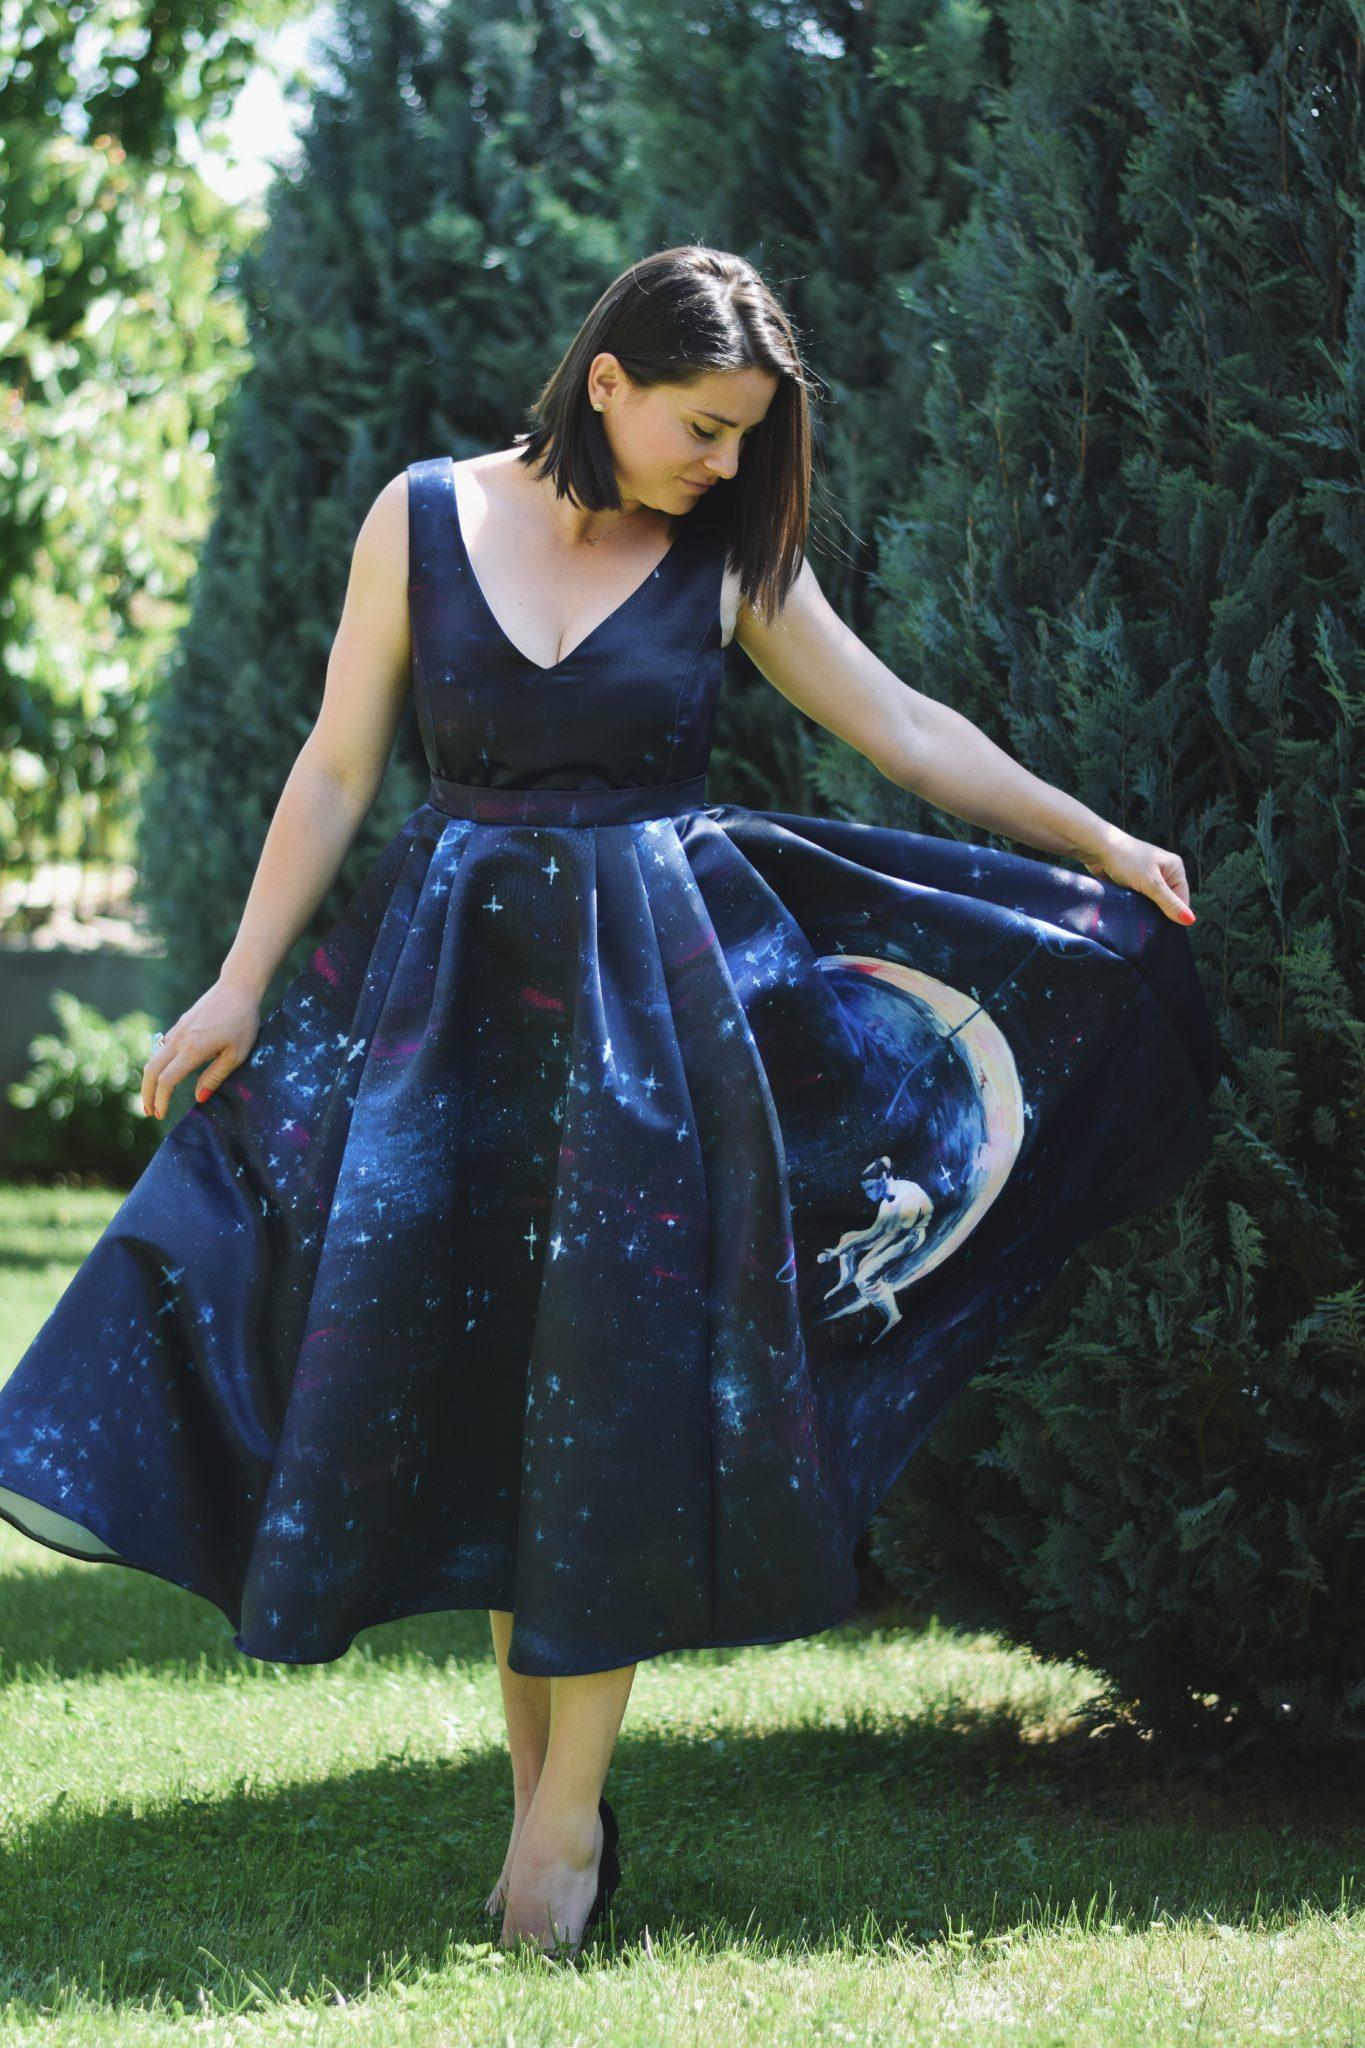 Rochia de ocazie cu imprimeu | Sinestezic | #SinestezicQueens | Alina Nicoleta Ene